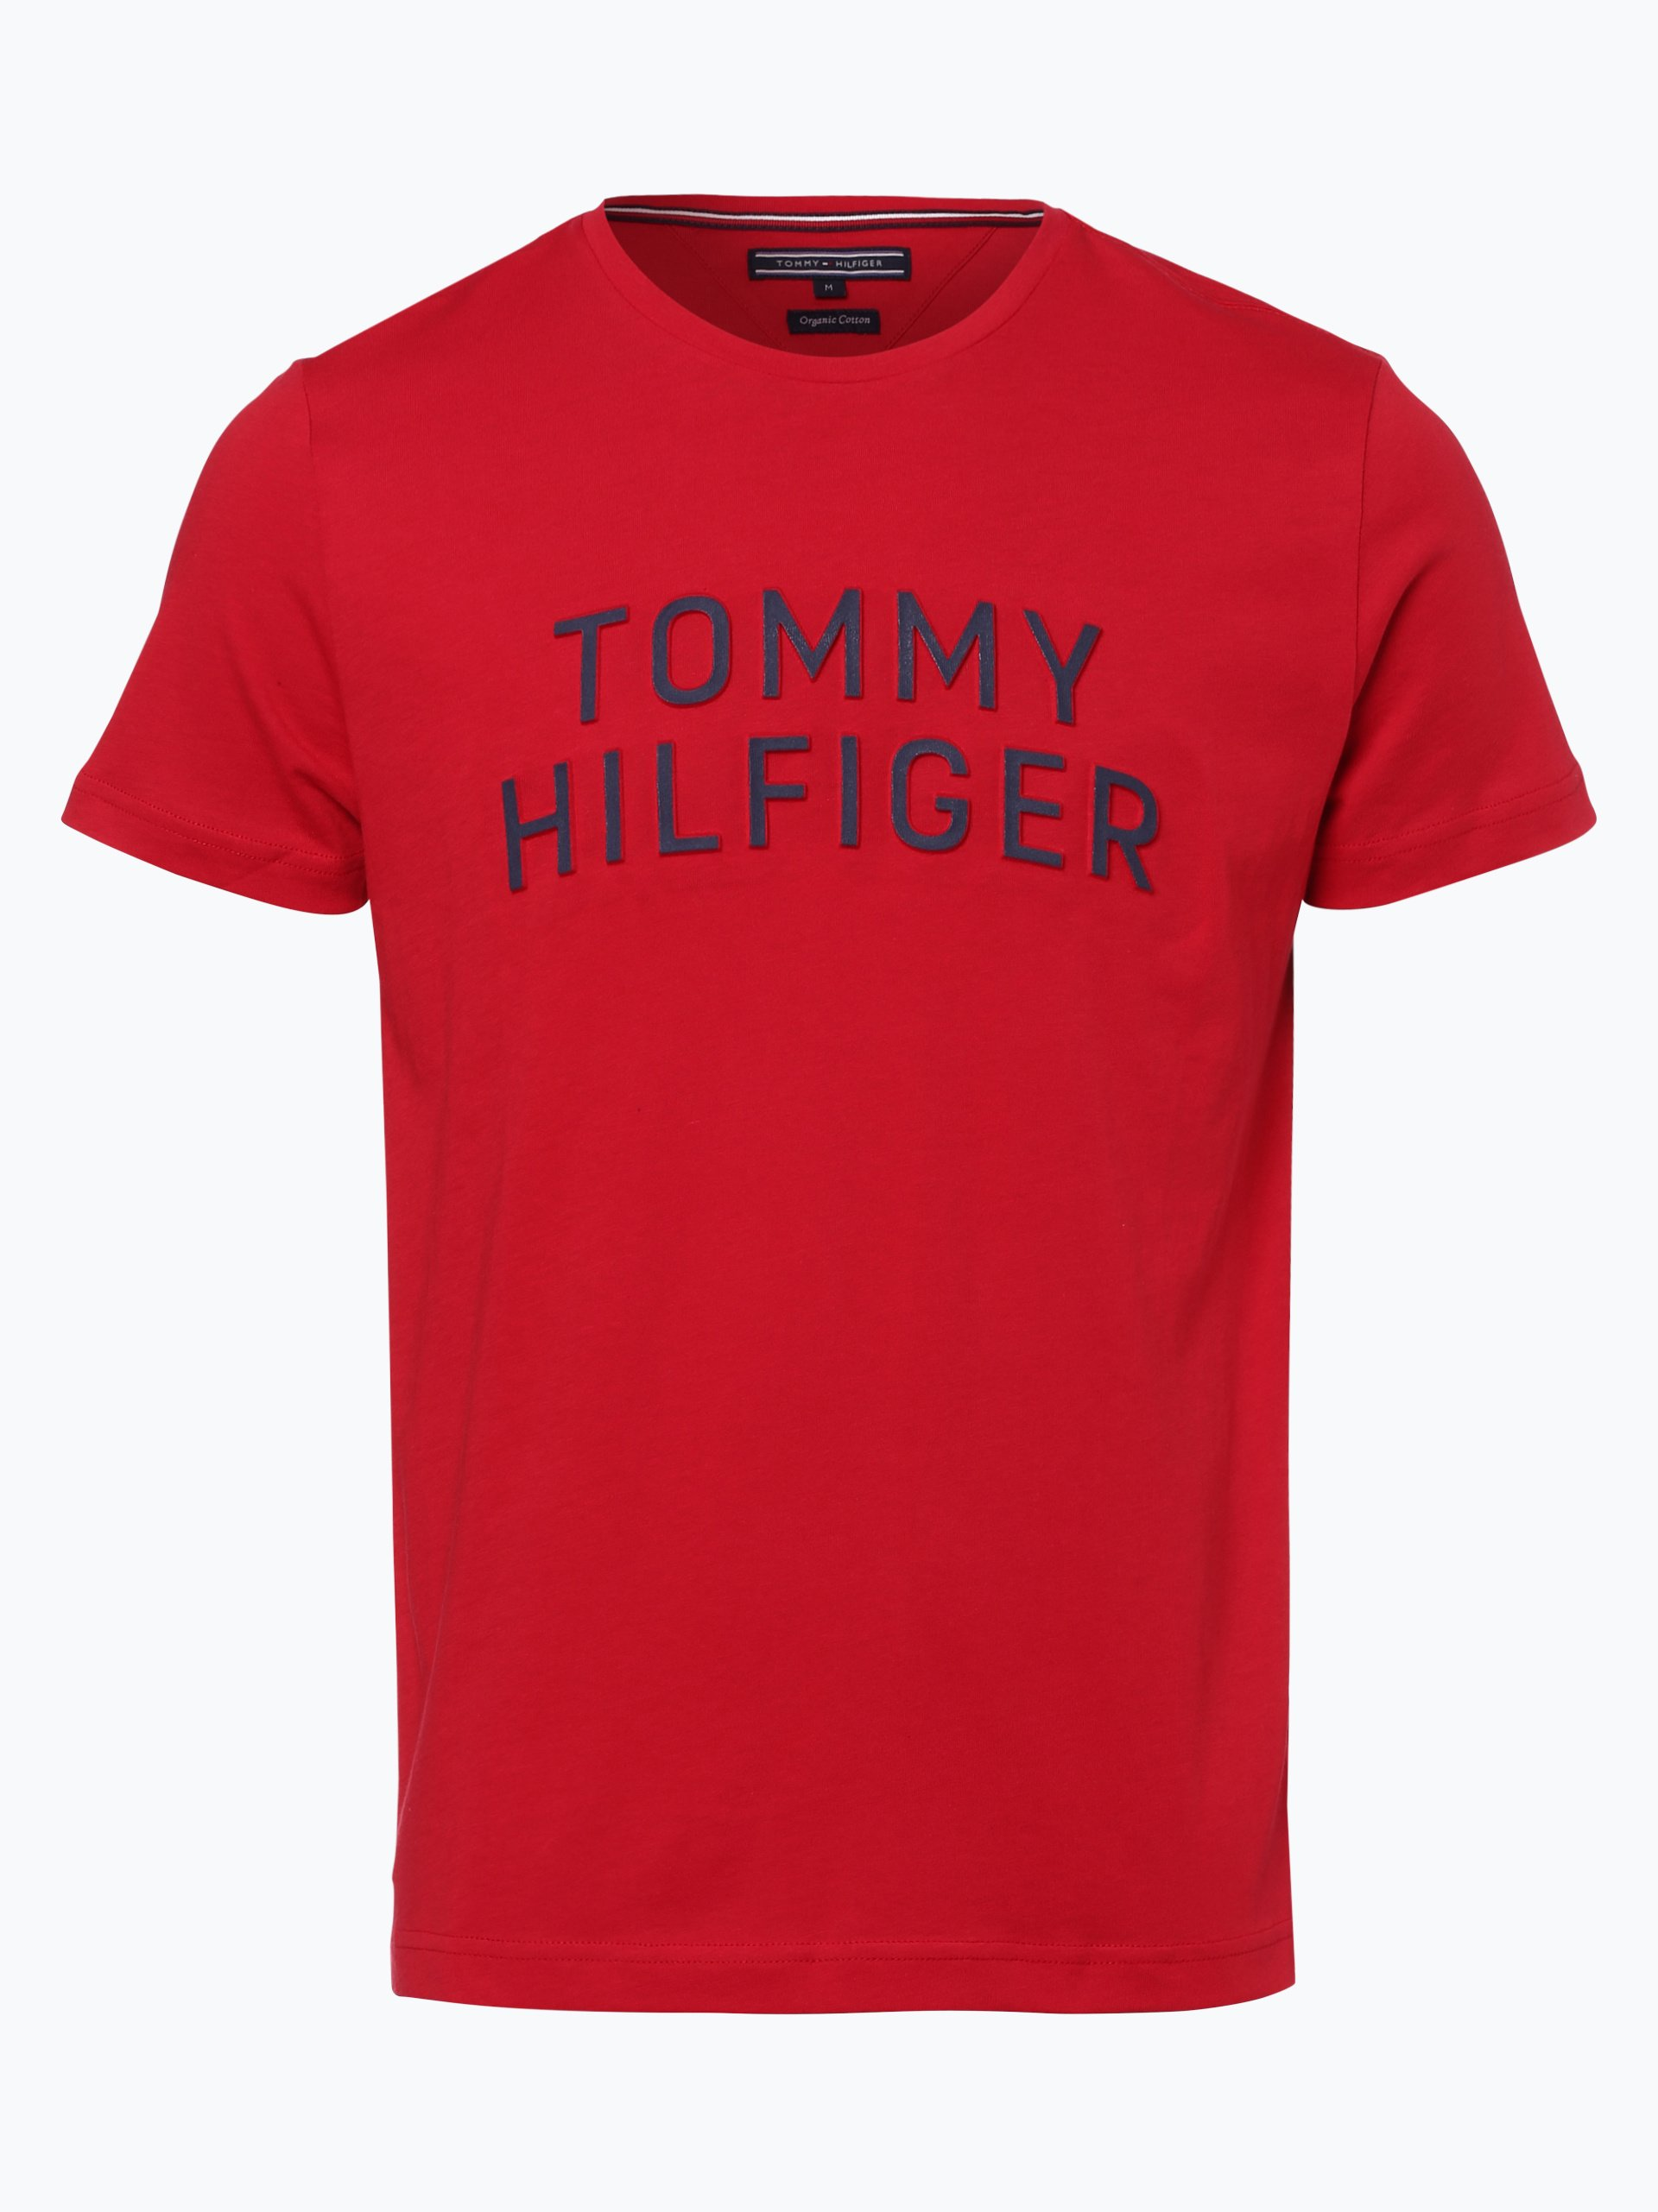 tommy hilfiger herren t shirt rot gemustert online kaufen. Black Bedroom Furniture Sets. Home Design Ideas